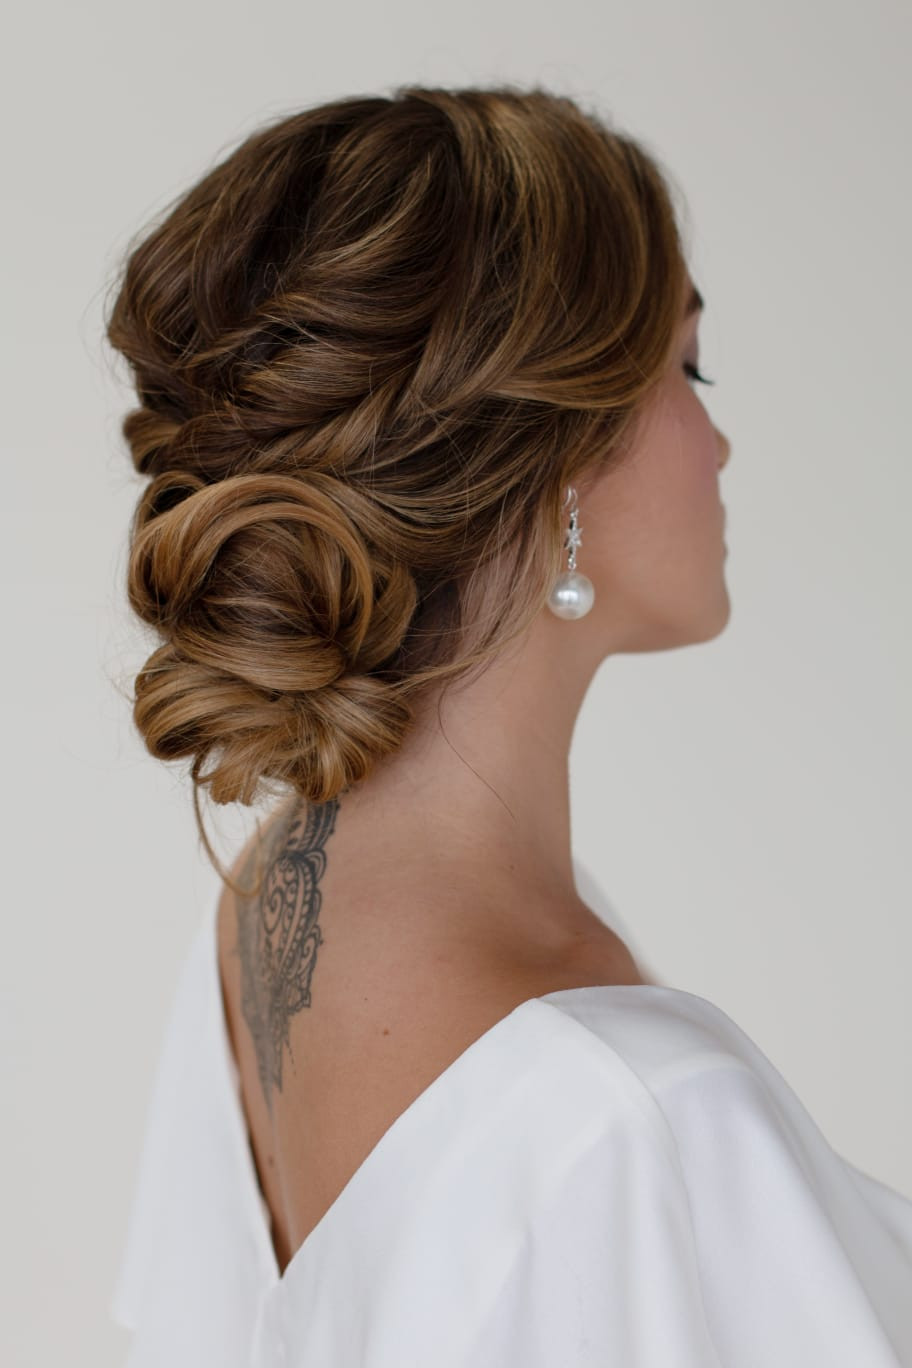 - Make Me Bridal Artist: Cheveux cimone. Photography by: Kerry Regan. #glamorous #curls #bridalhair #hairup #texture #texturedupdo